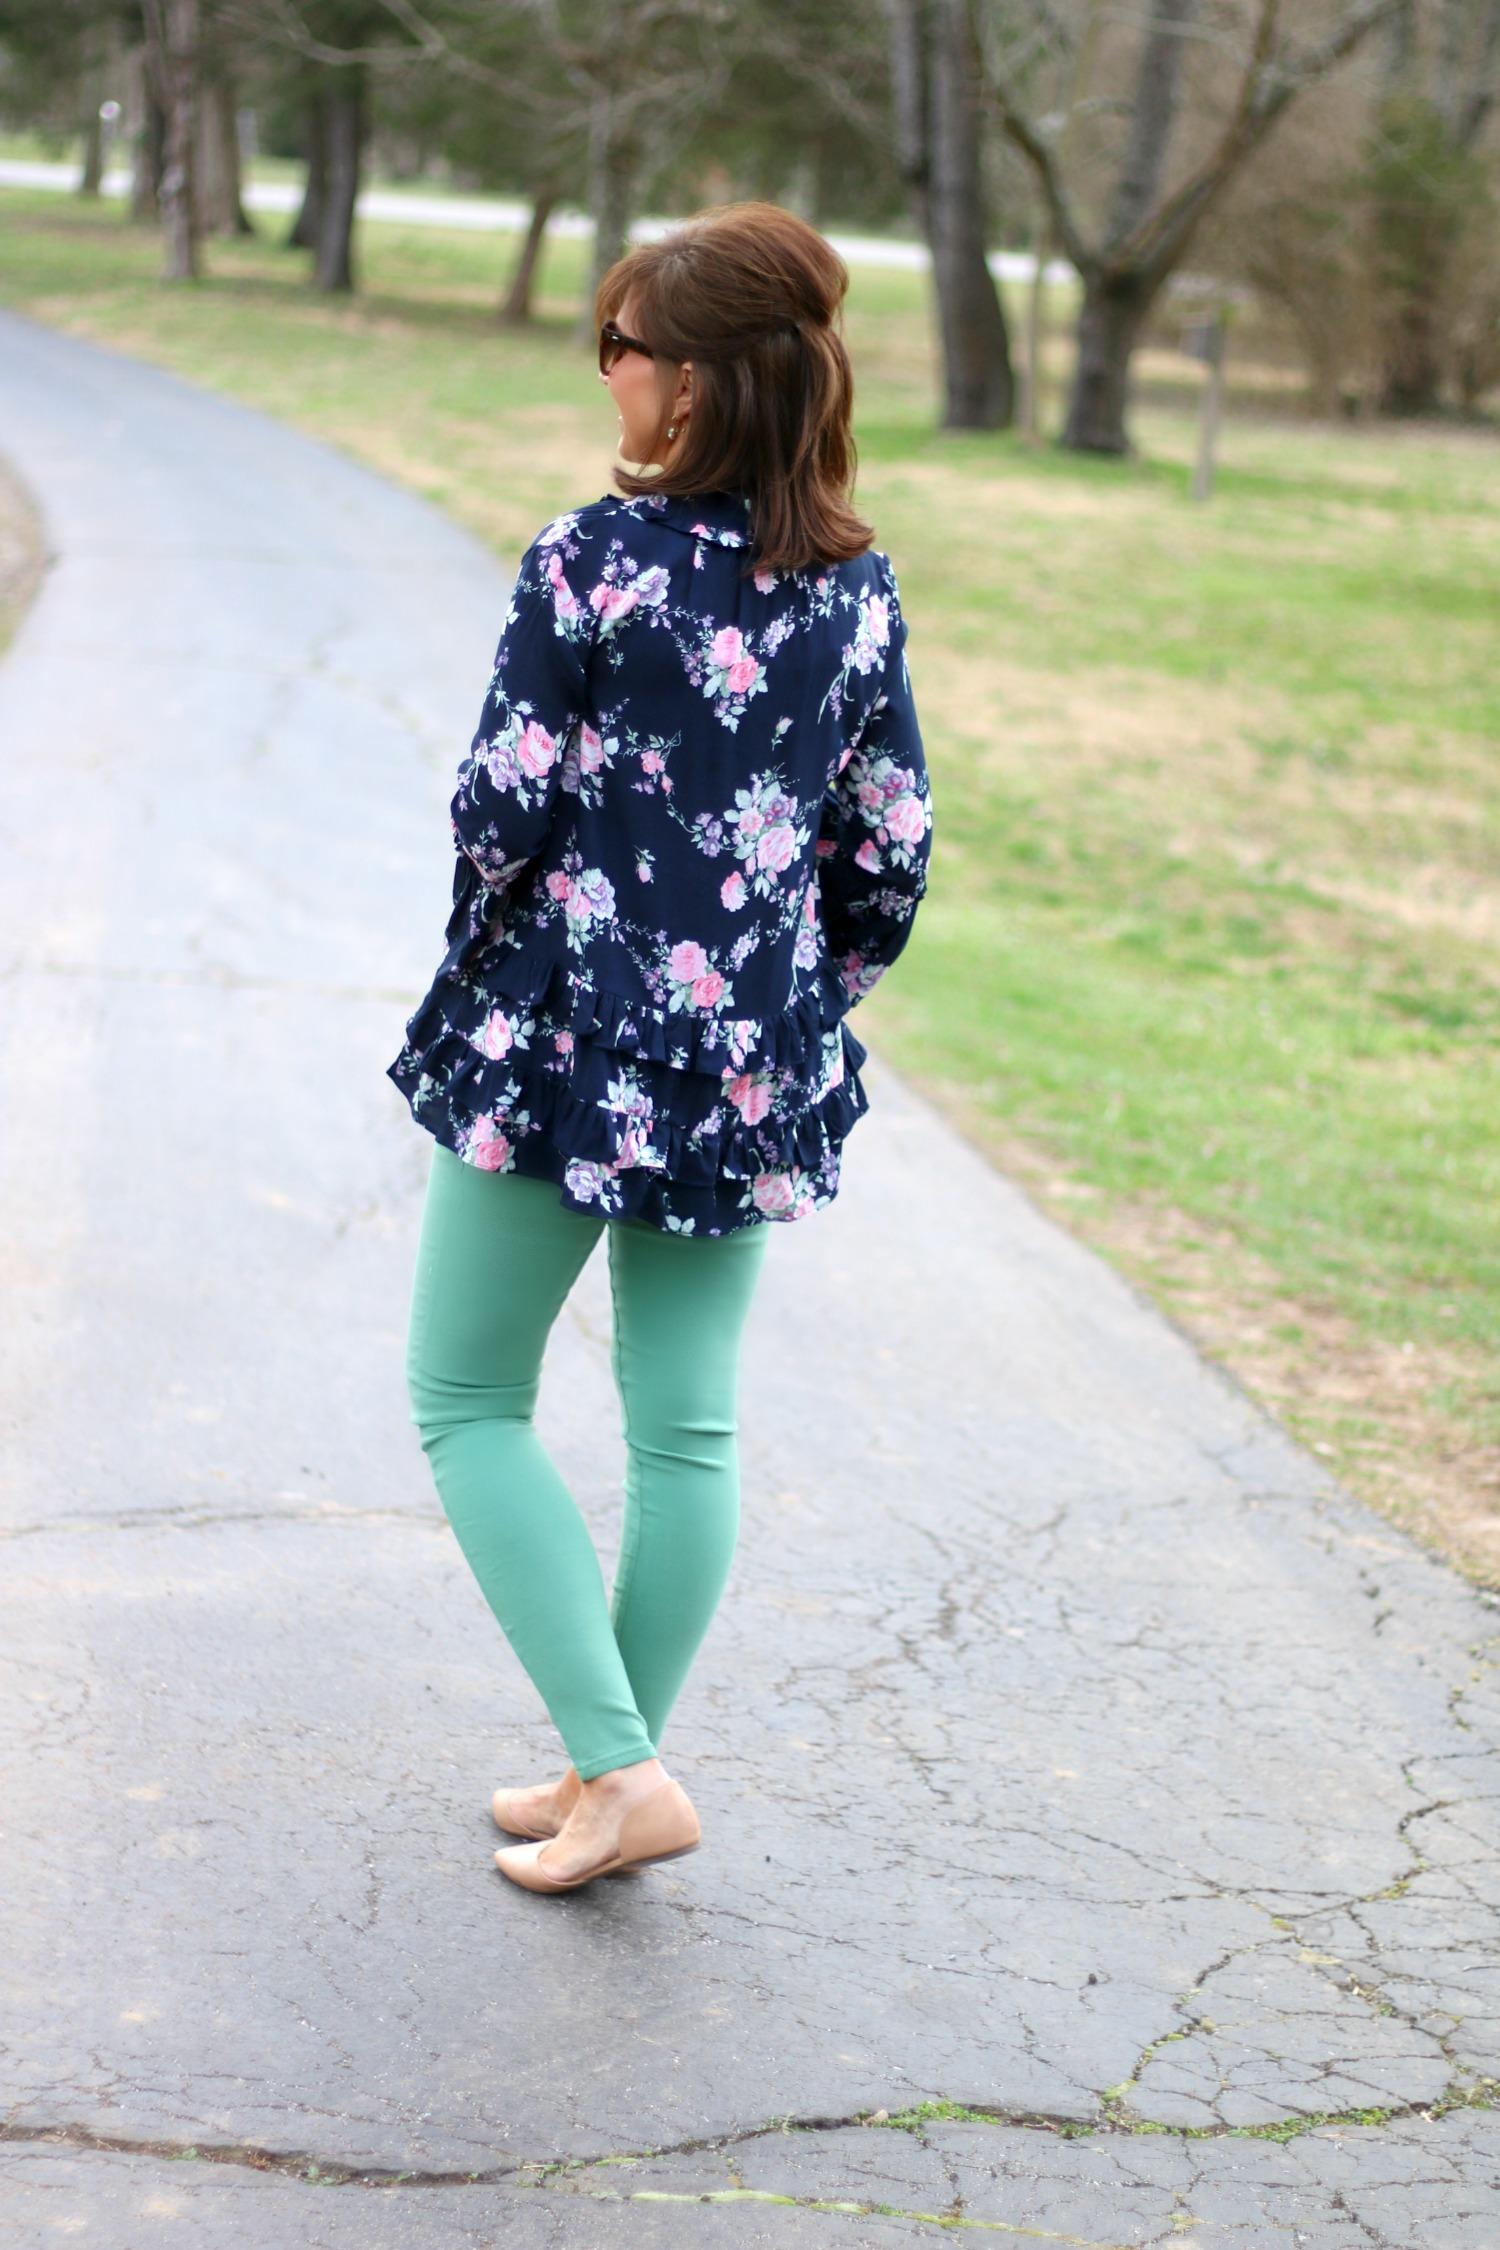 27 Days of Spring Fashion: Khaki Vest & Floral Top